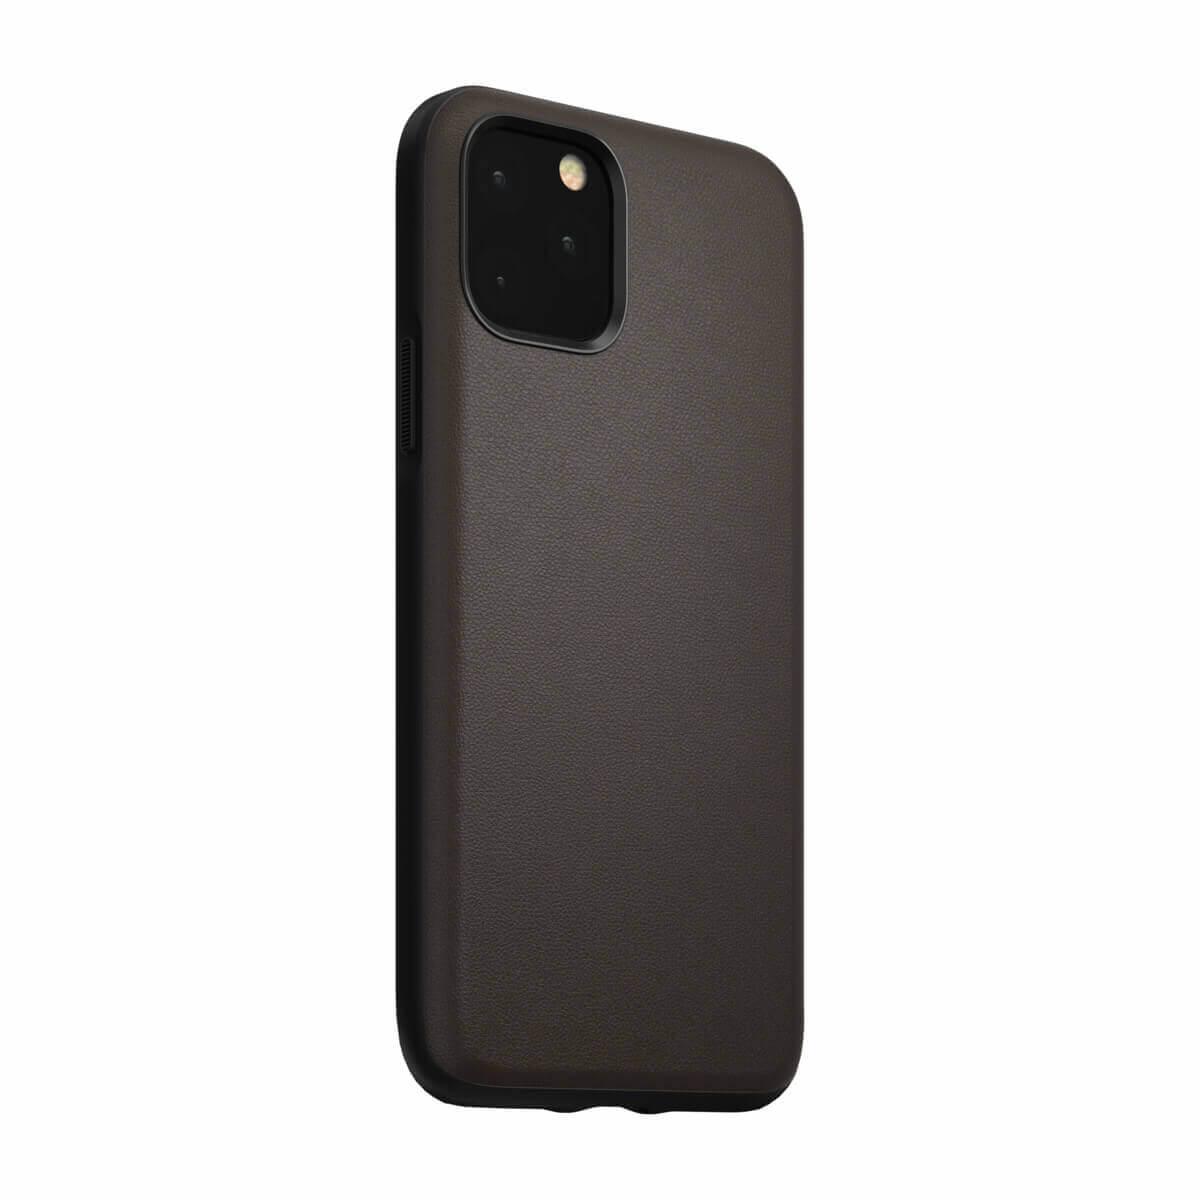 Nomad Leather Rugged Waterproof Case — кожен (естествена кожа) кейс за iPhone 11 Pro Max (кафяв) - 1